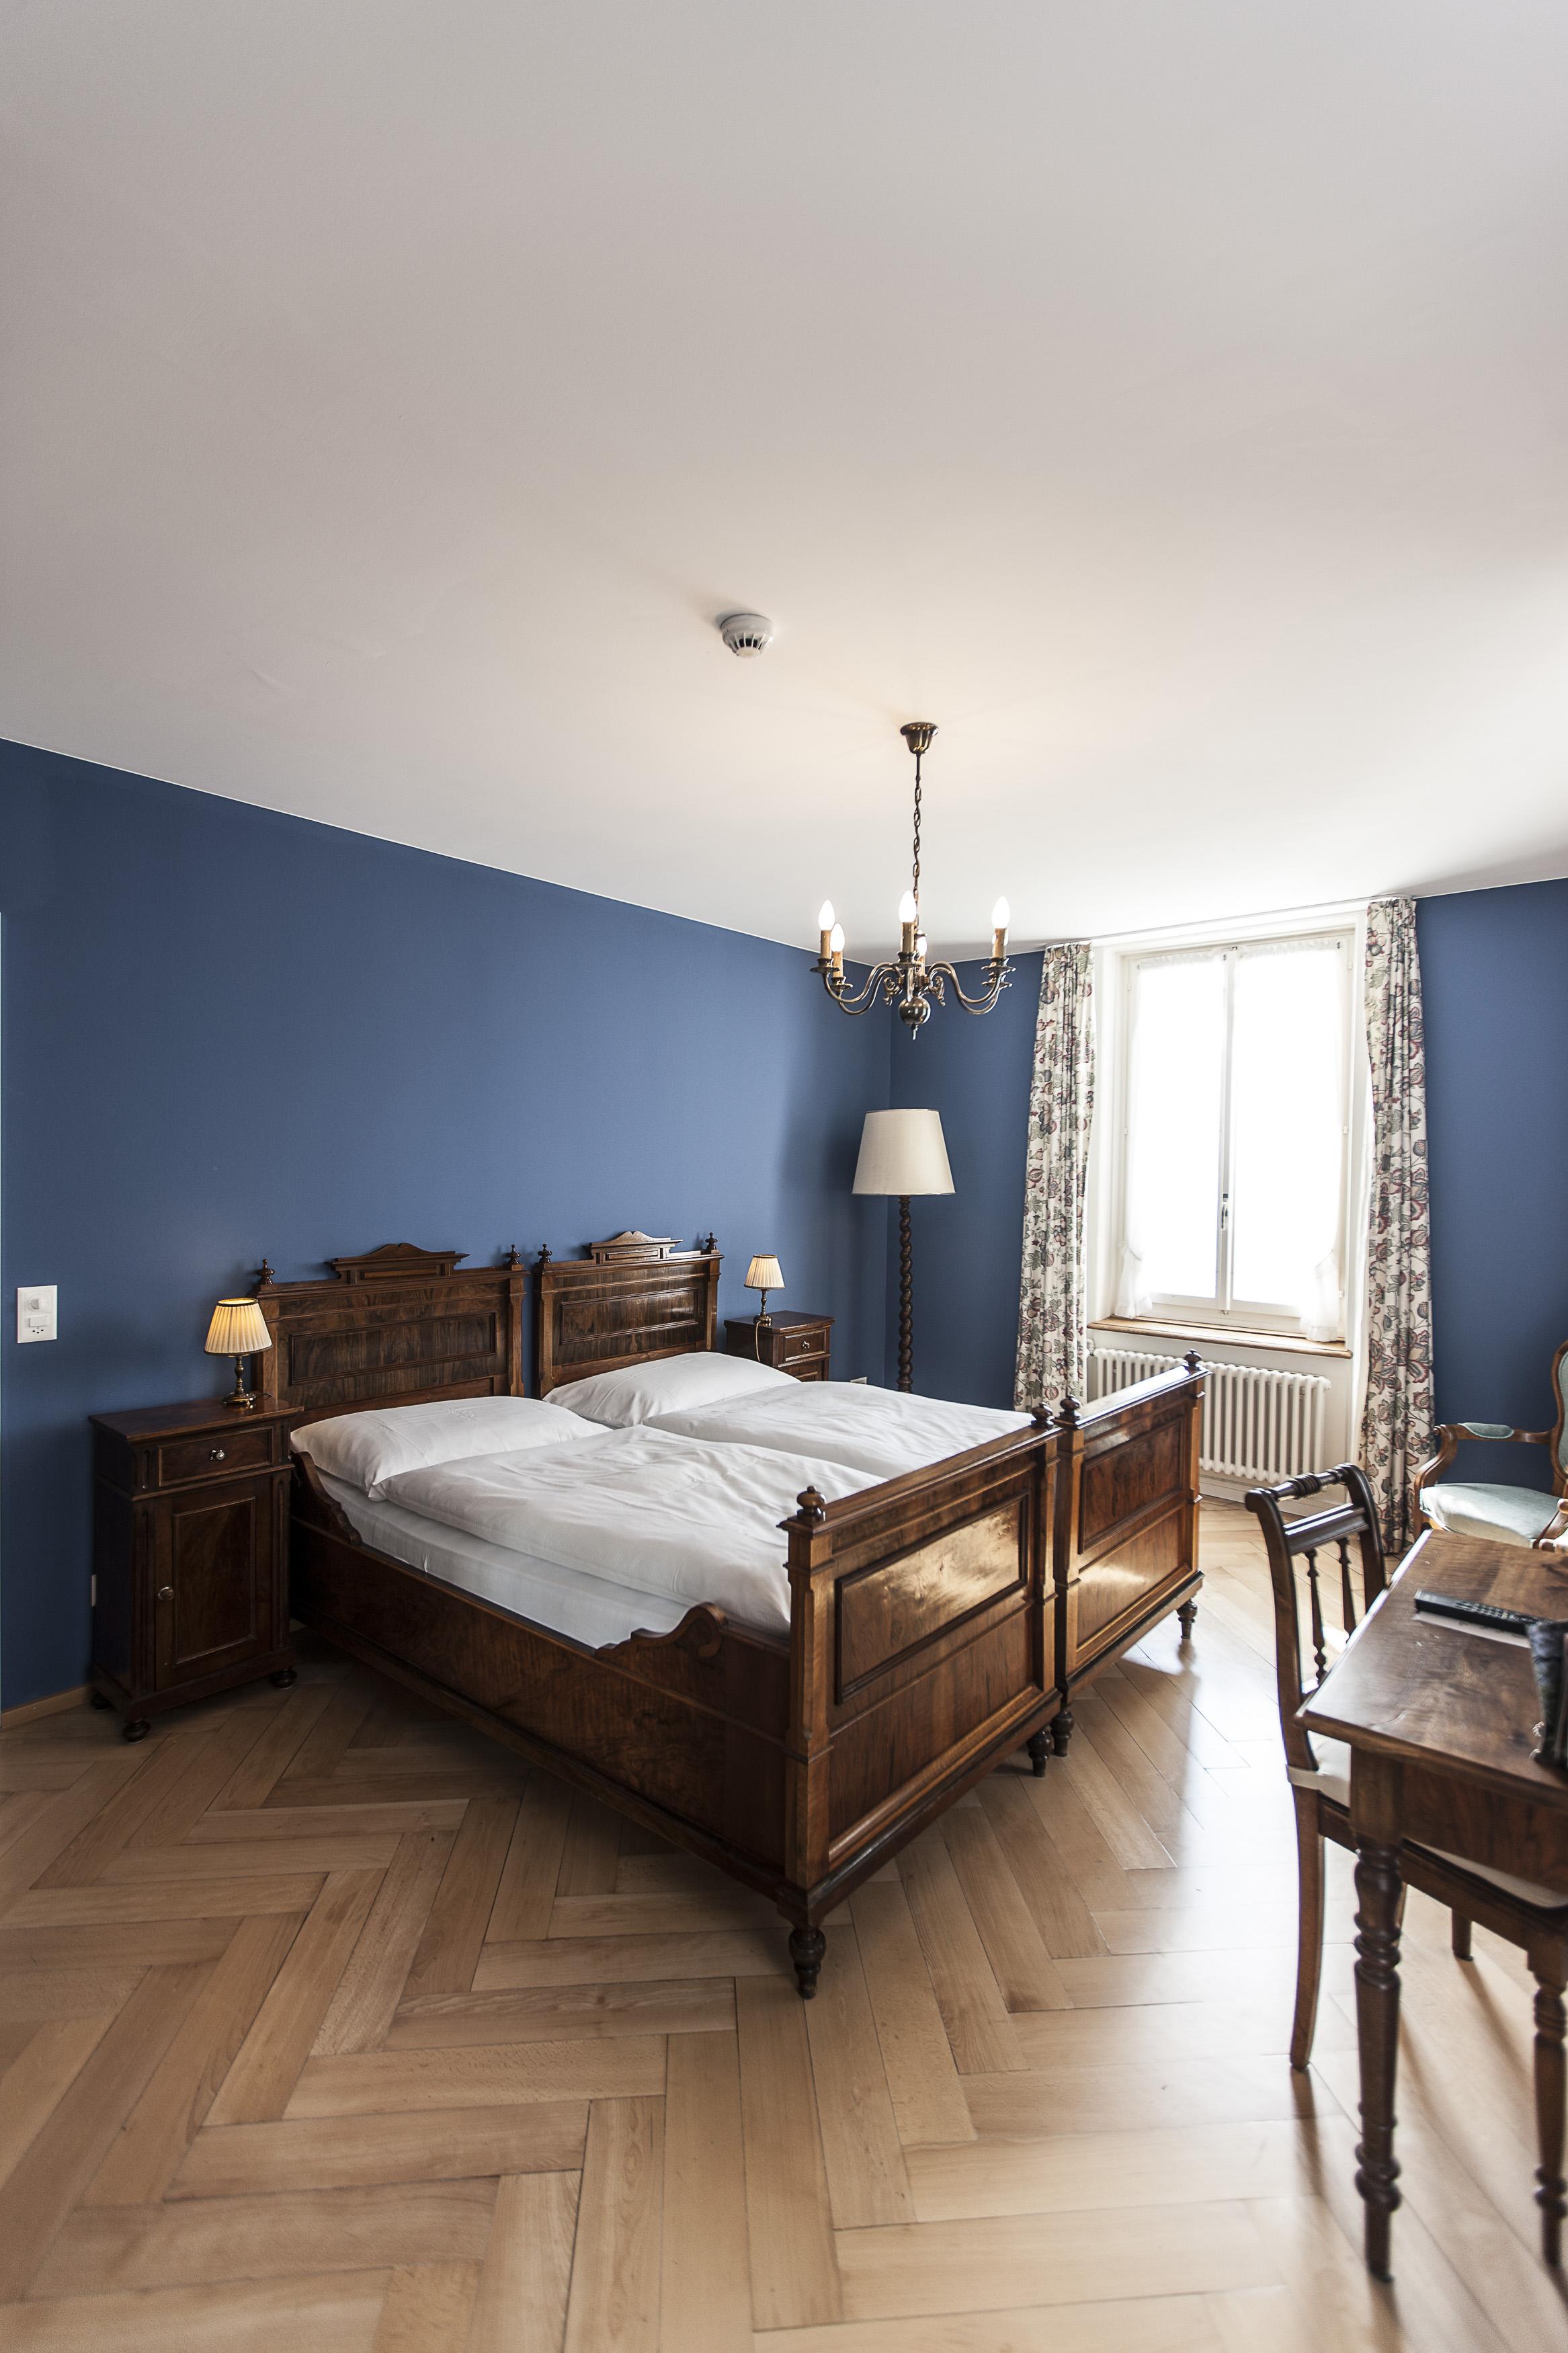 superiorzimmer 207 hotel terrasse am see. Black Bedroom Furniture Sets. Home Design Ideas